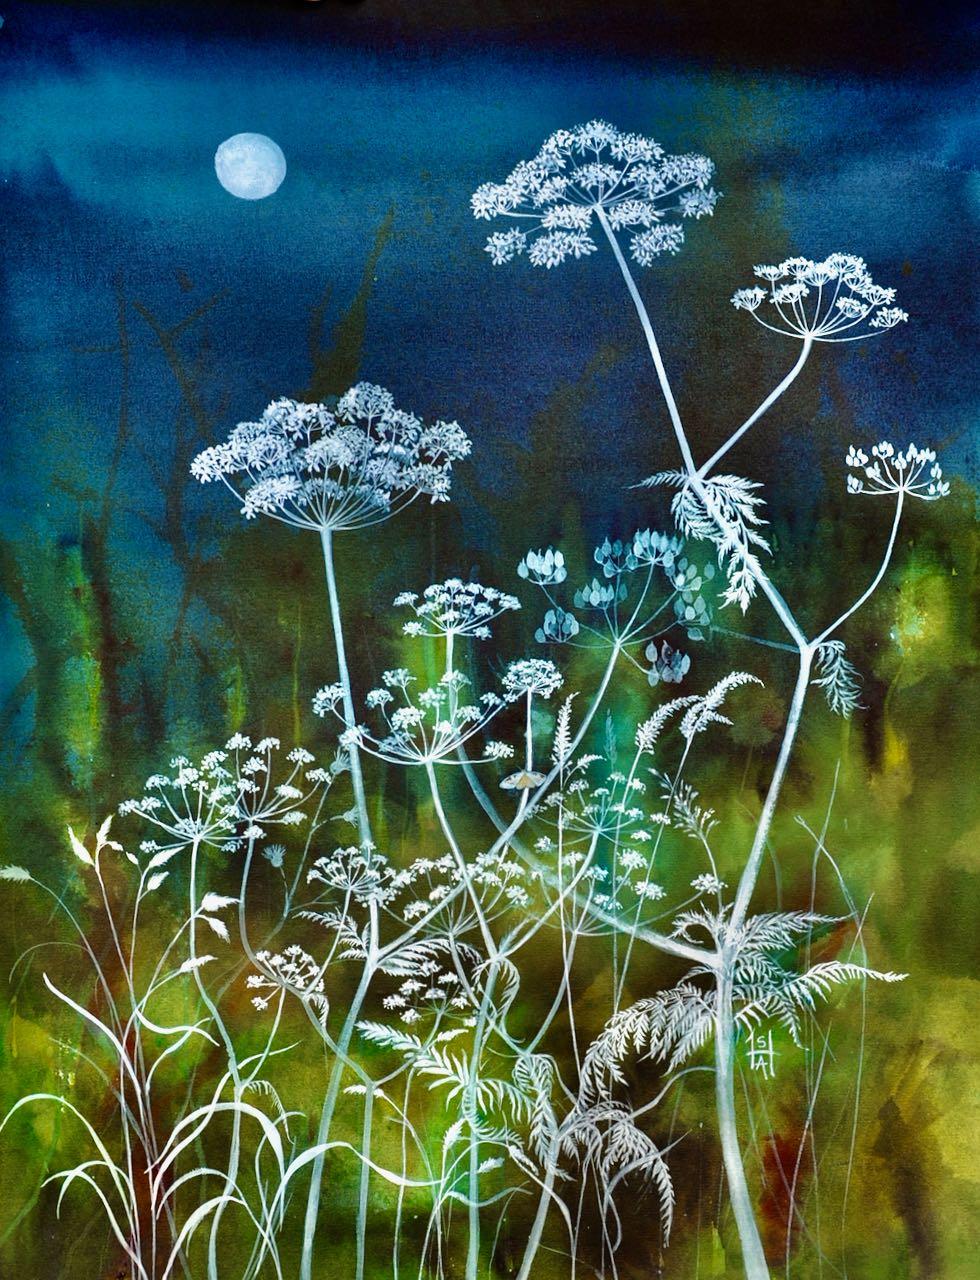 SAH-Night-life, watercolour &gouache on paper, U/F image H47xW37cm